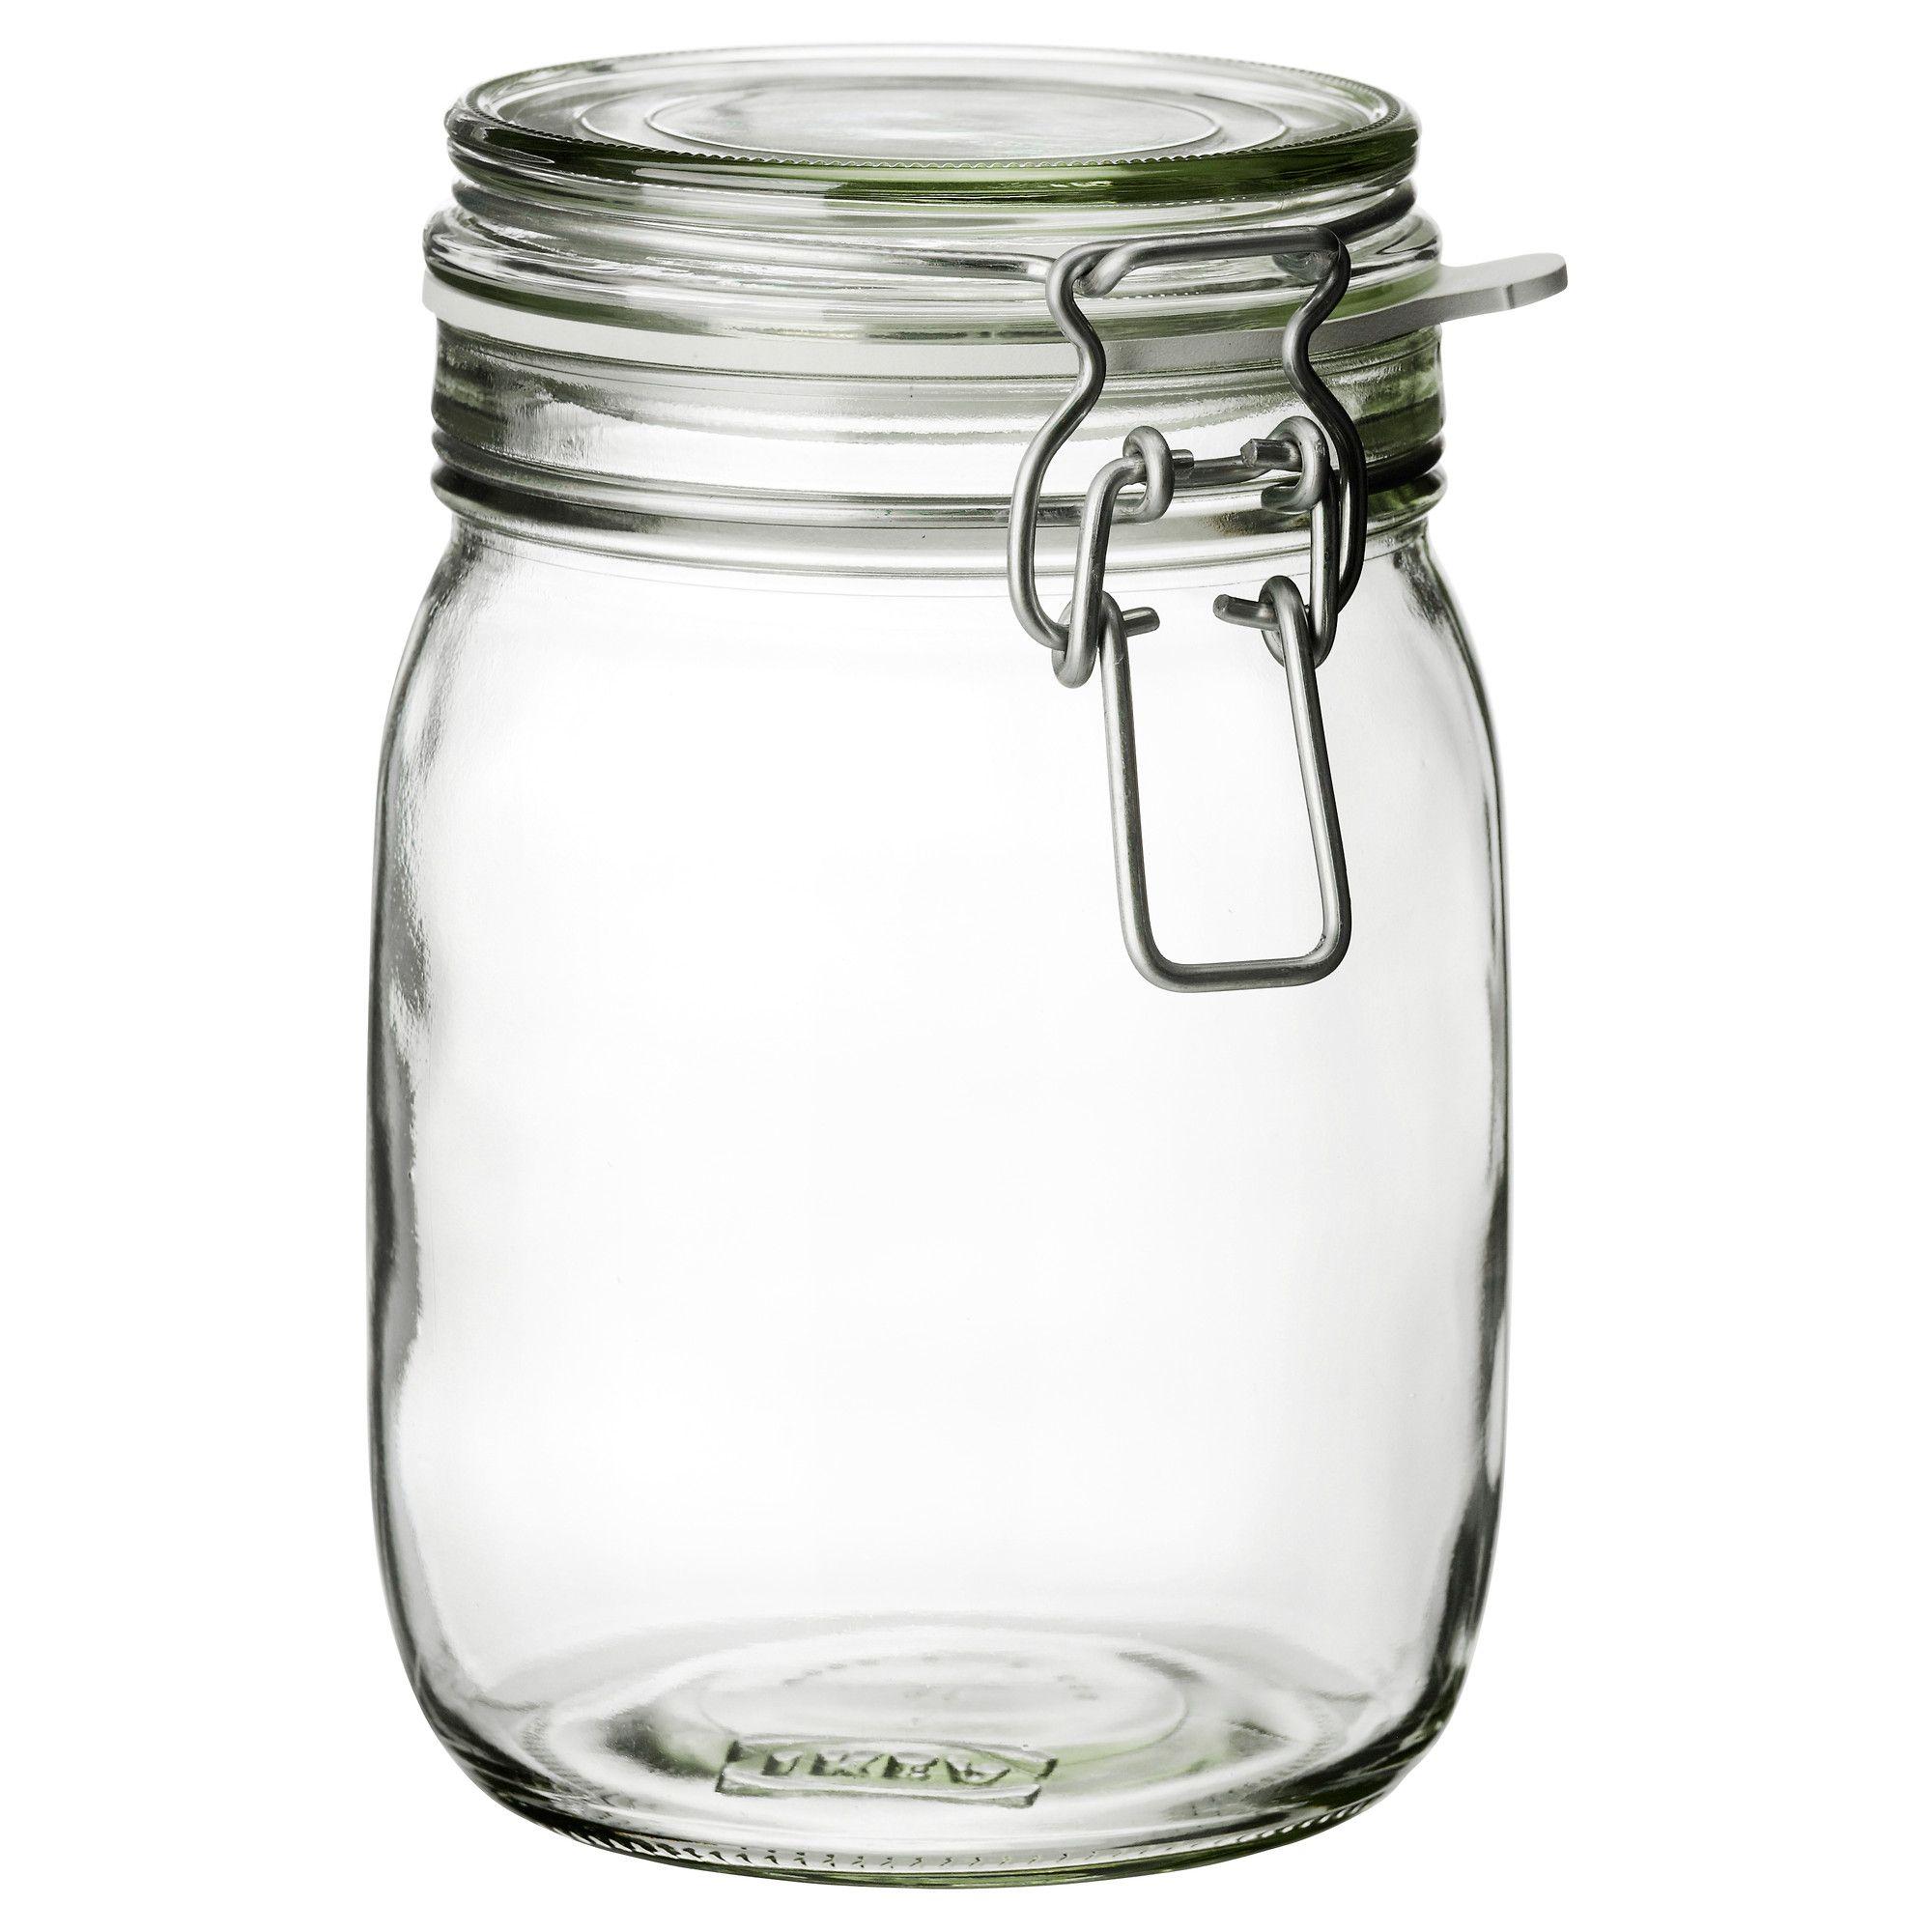 KORKEN Jar with lid, clear glass | Dream Home | Jar storage